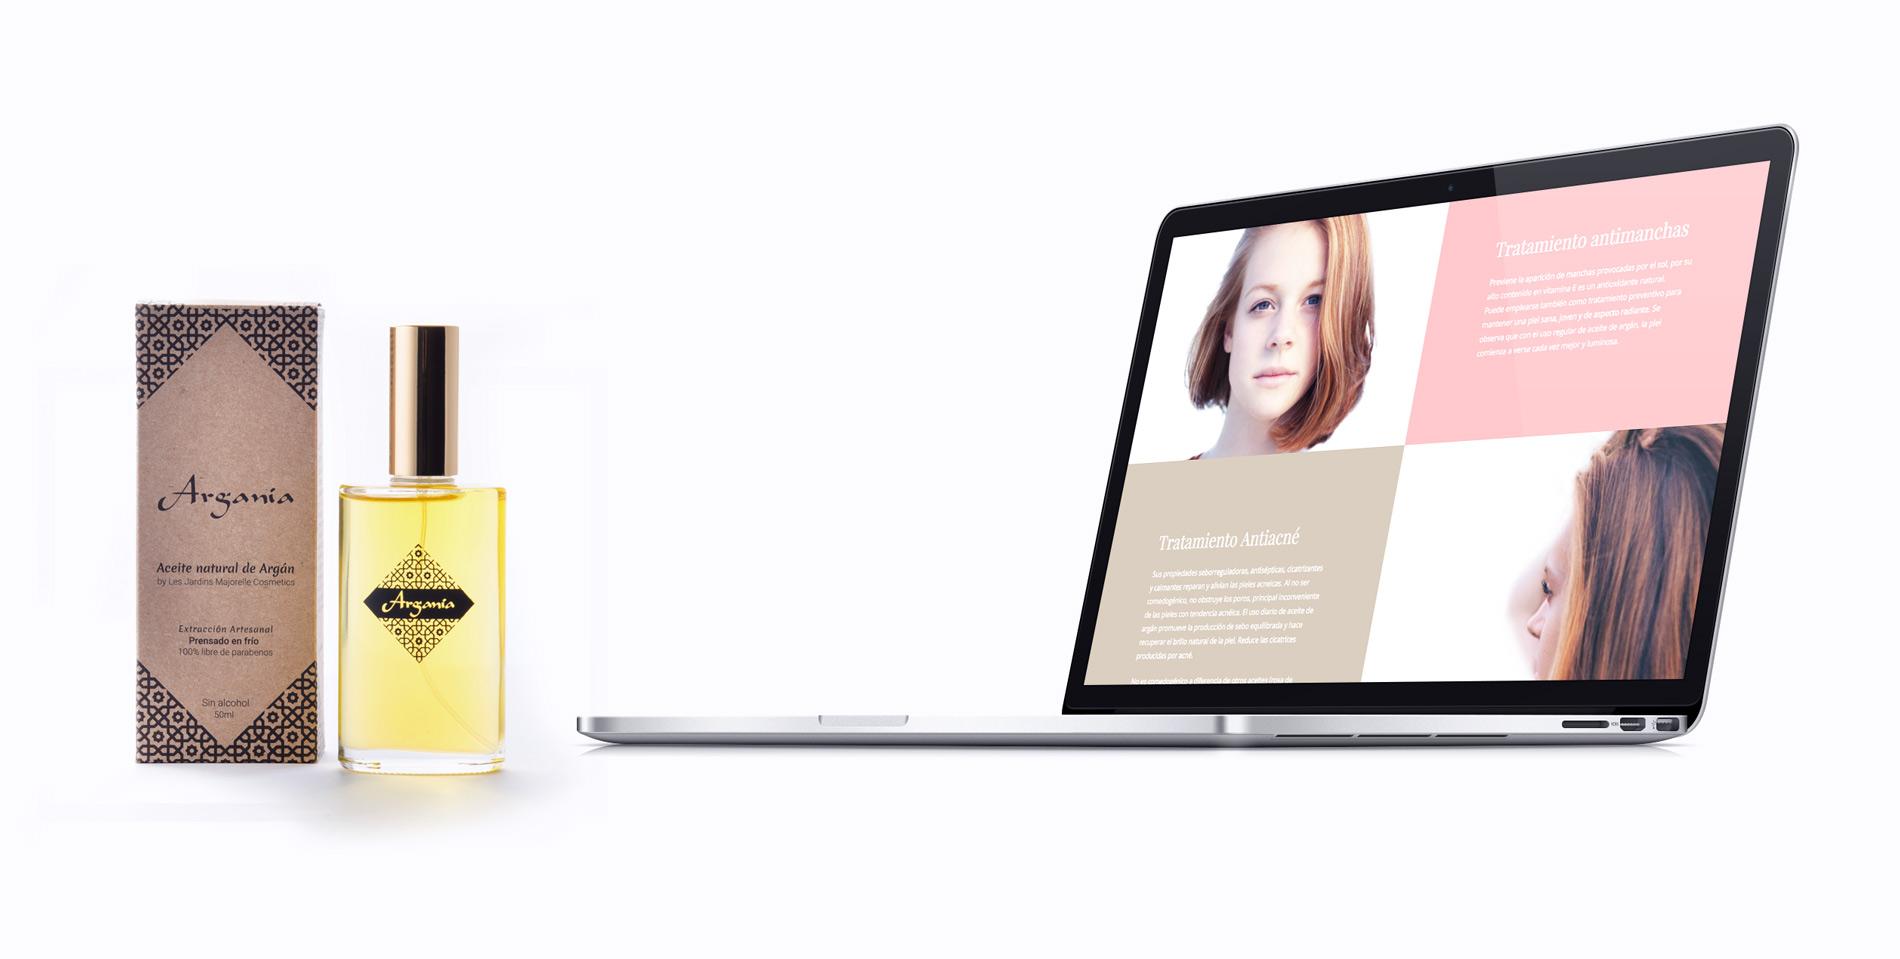 Diseño web para Les Jardins Majorelle Cosmetics